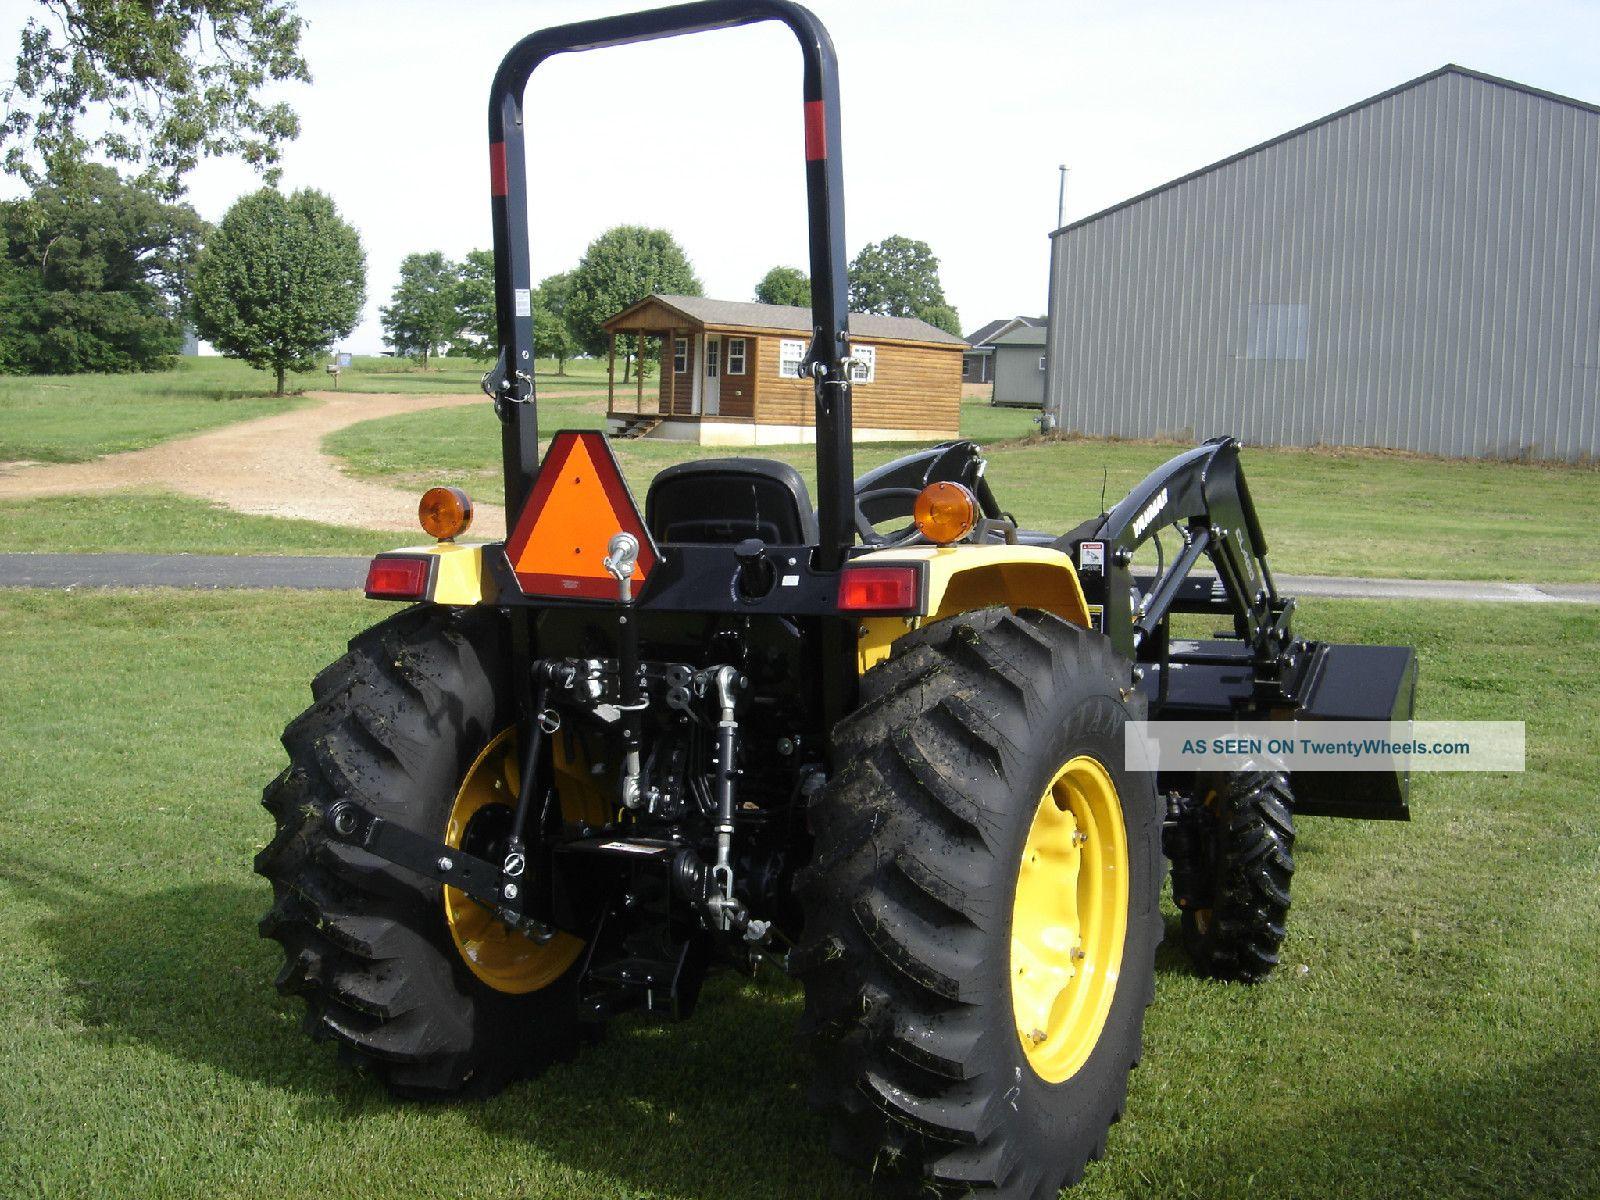 Cub Cadet Yanmar Ex450 Compact Utility Tractor Tractors photo 2